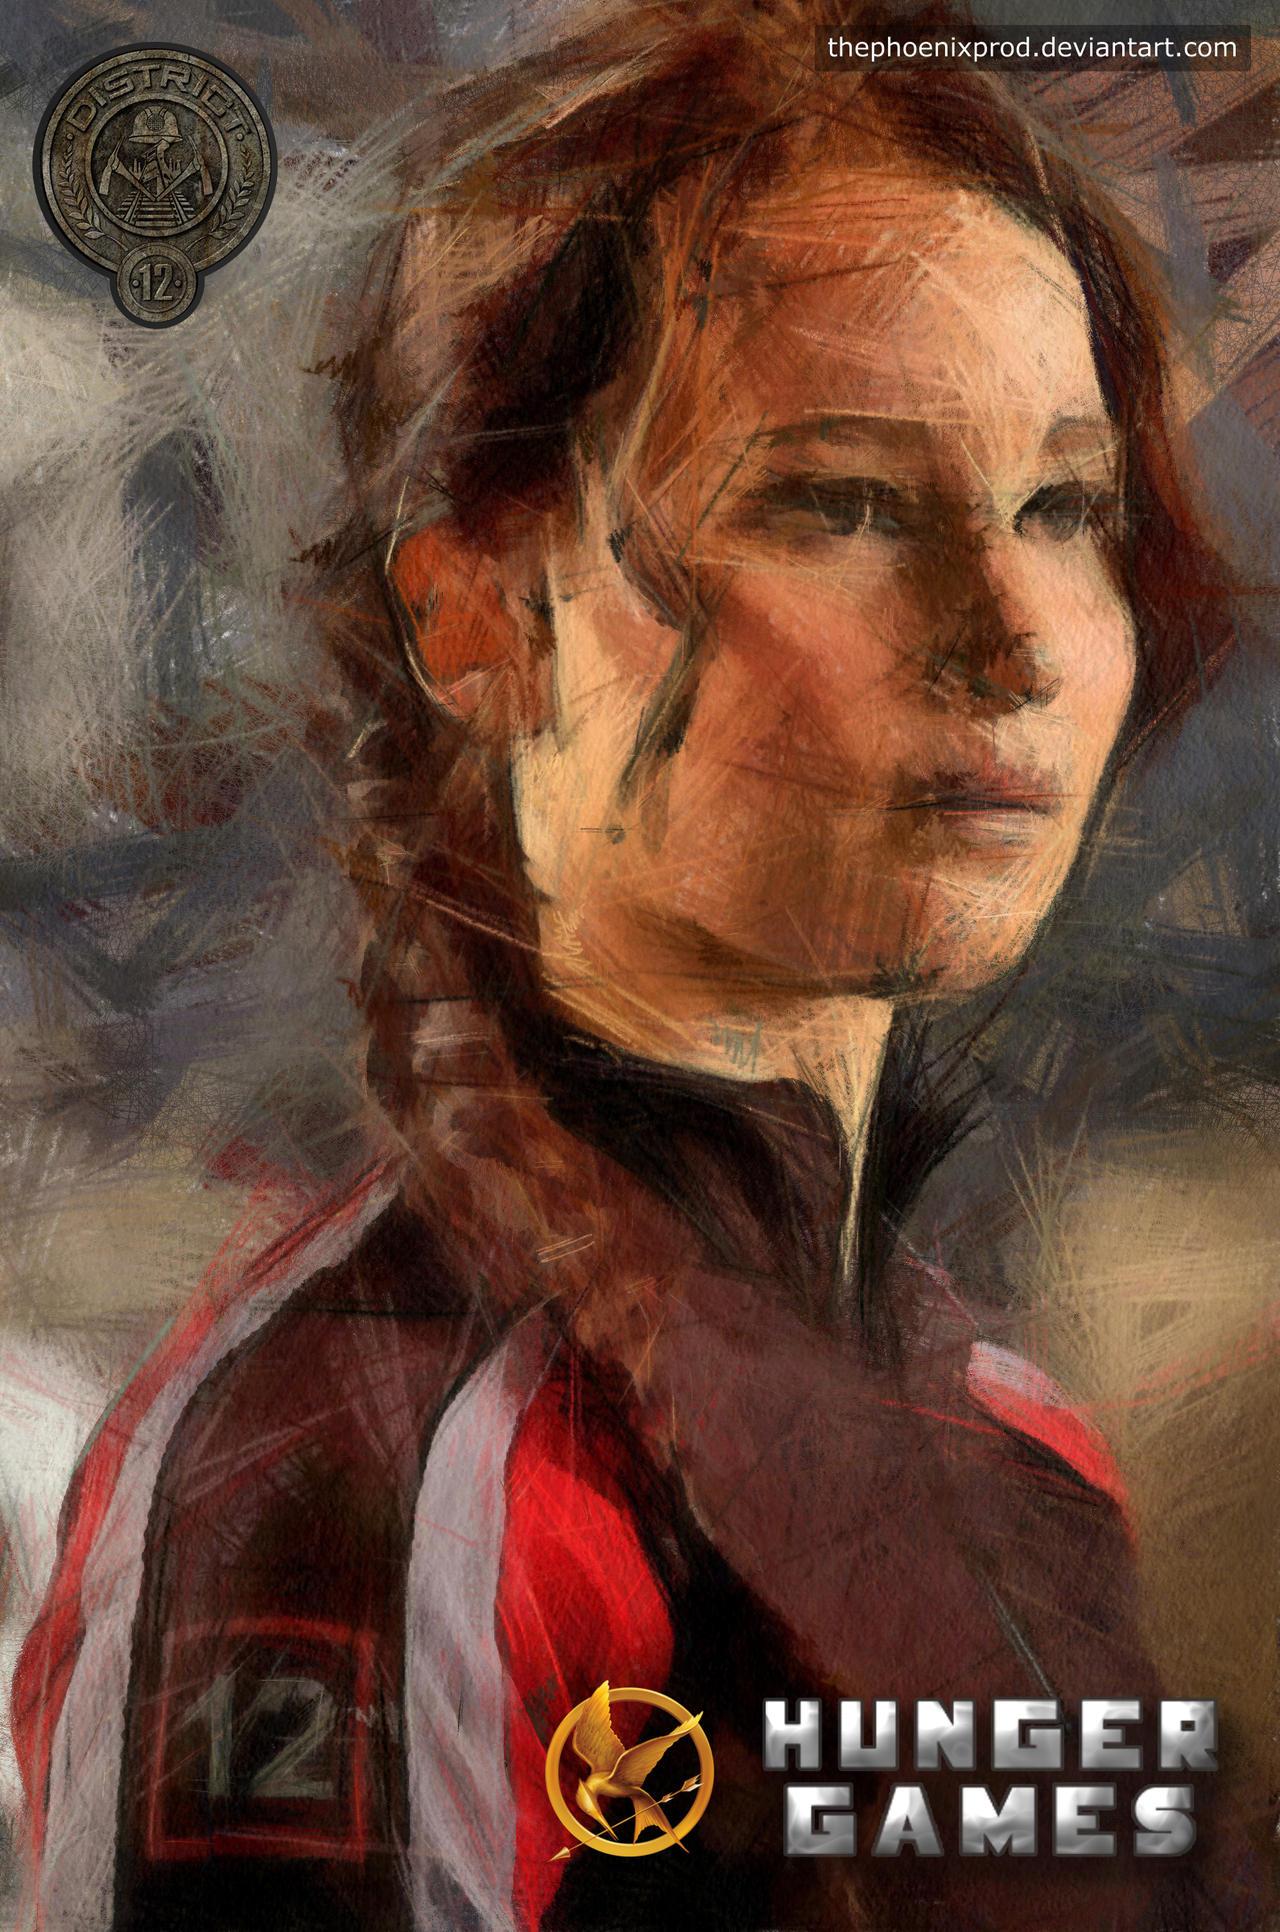 The Hunger Games - Katniss Everdeen by thephoenixprod